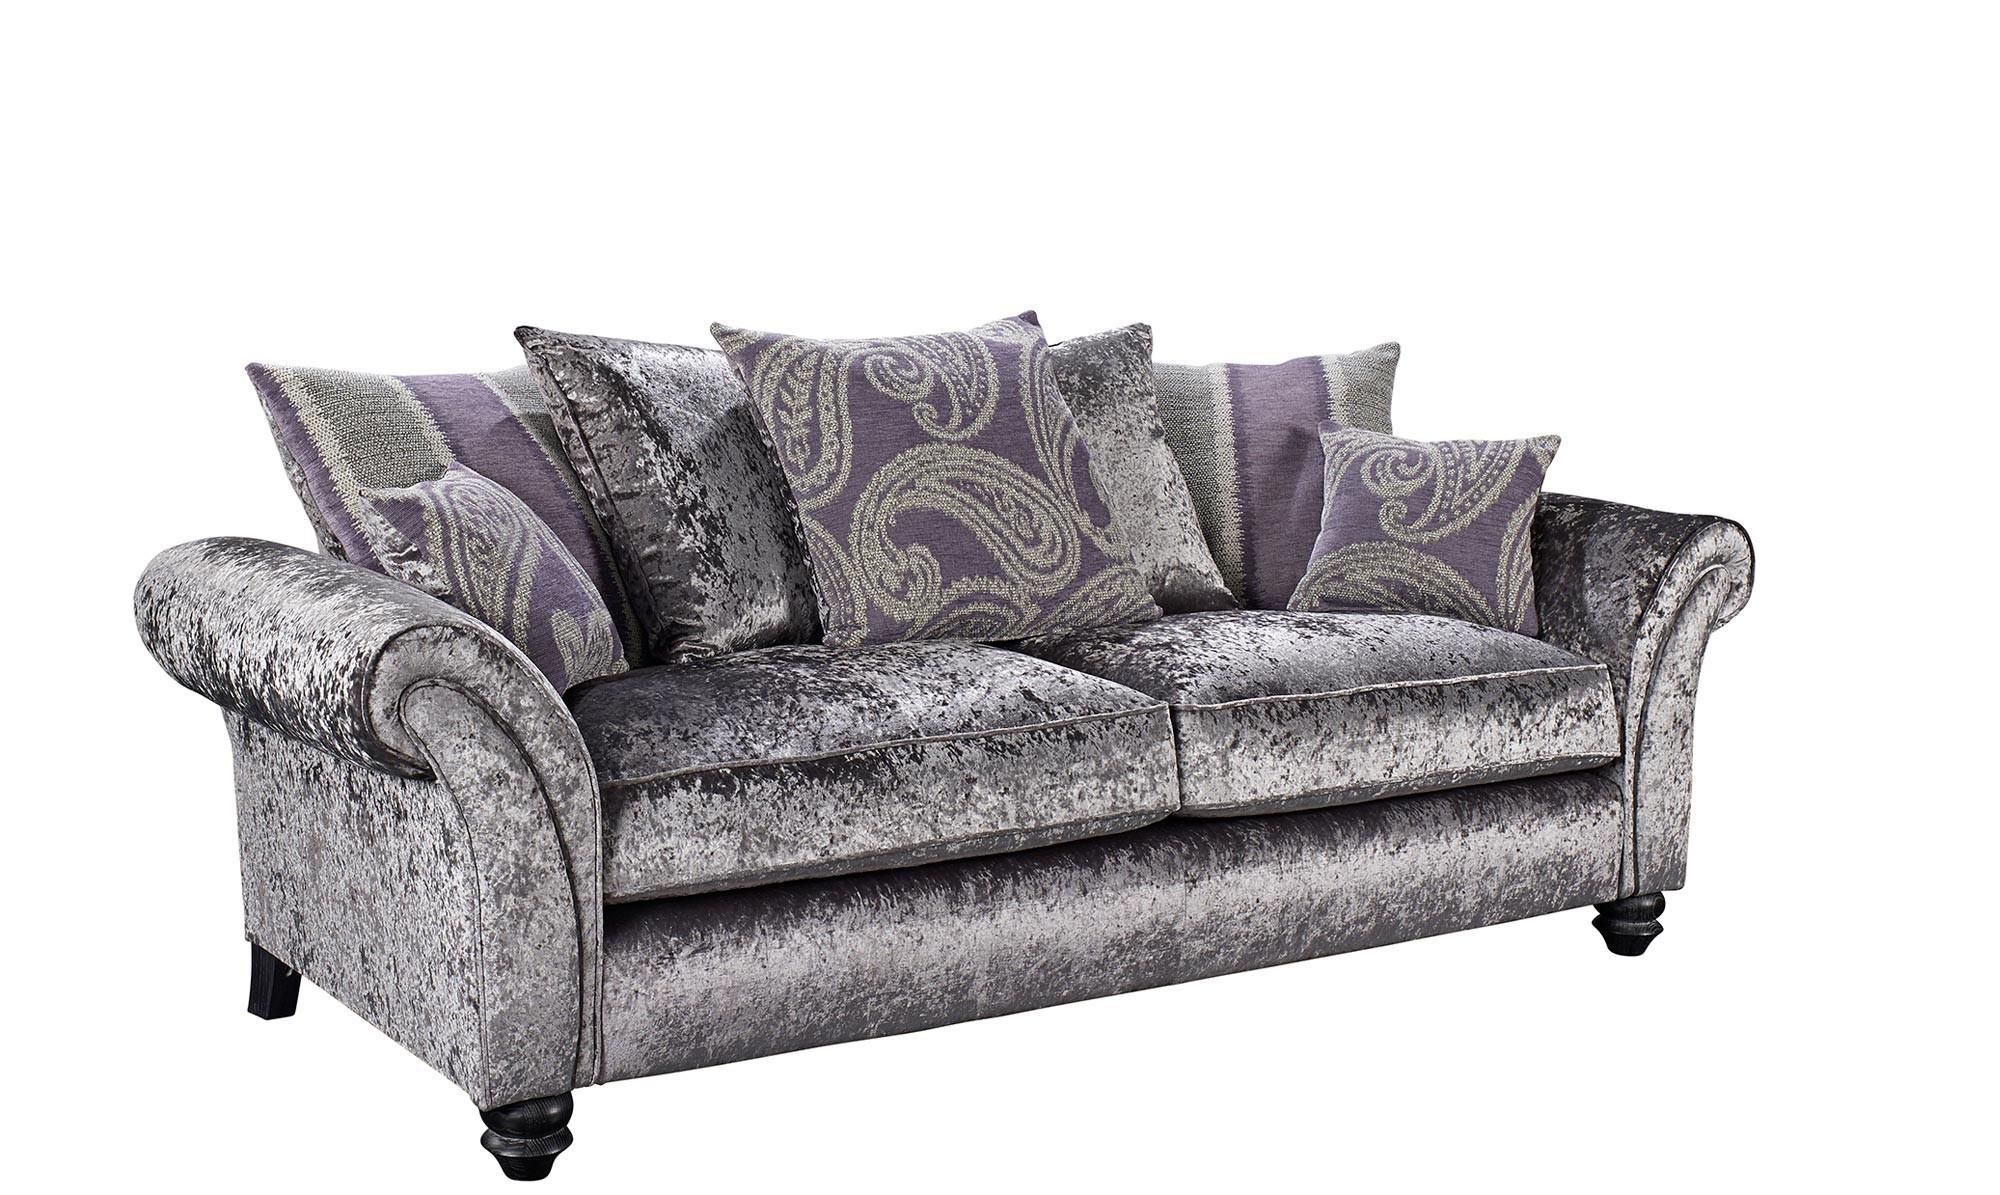 20 Collection of Loose Pillow Back Sofas  Sofa Ideas